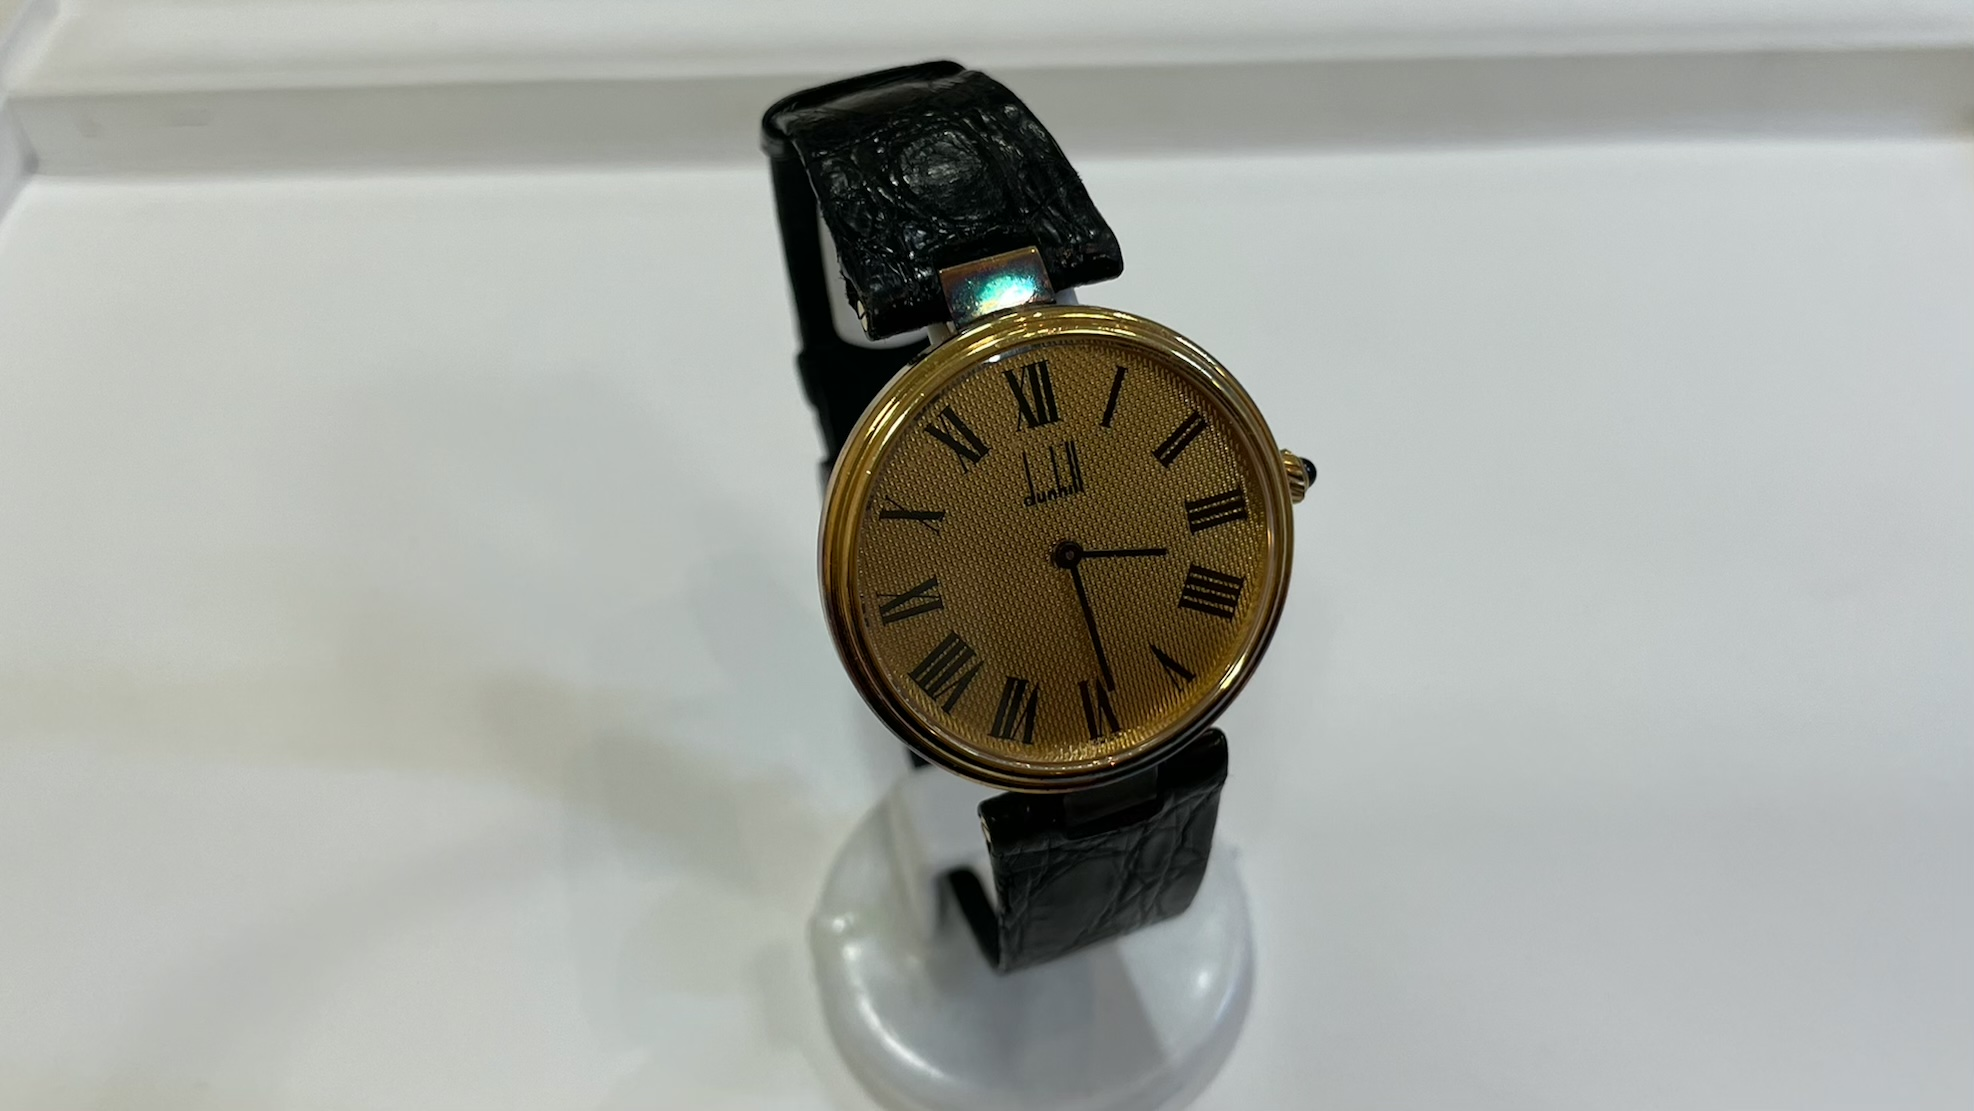 【買取速報】腕時計、SV925、DUNHILL-2021-04-27